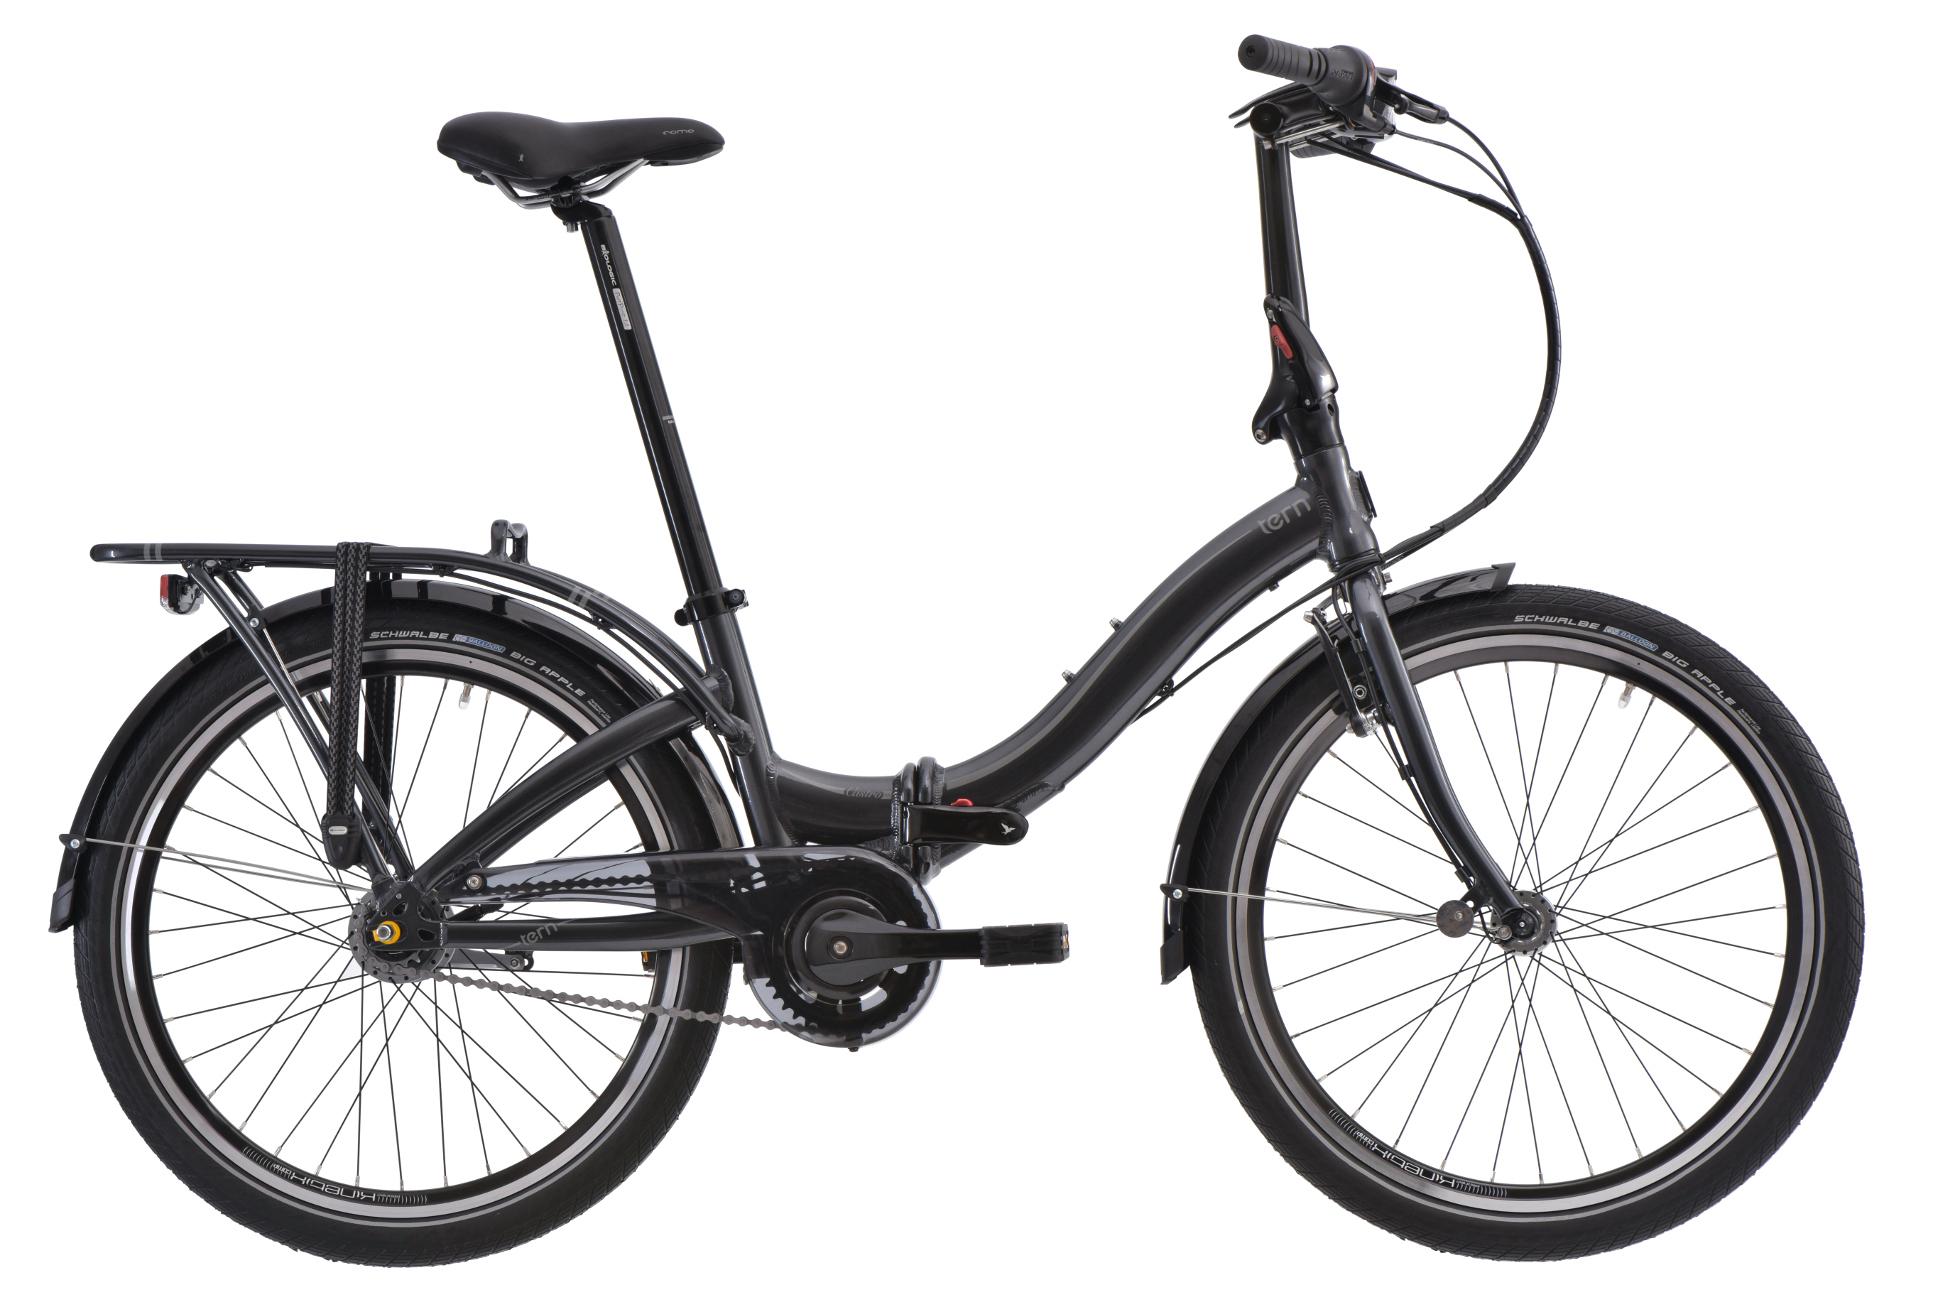 TERN Gabel 24Zoll passend für Castro P7i grau 954000034 Fahrrad